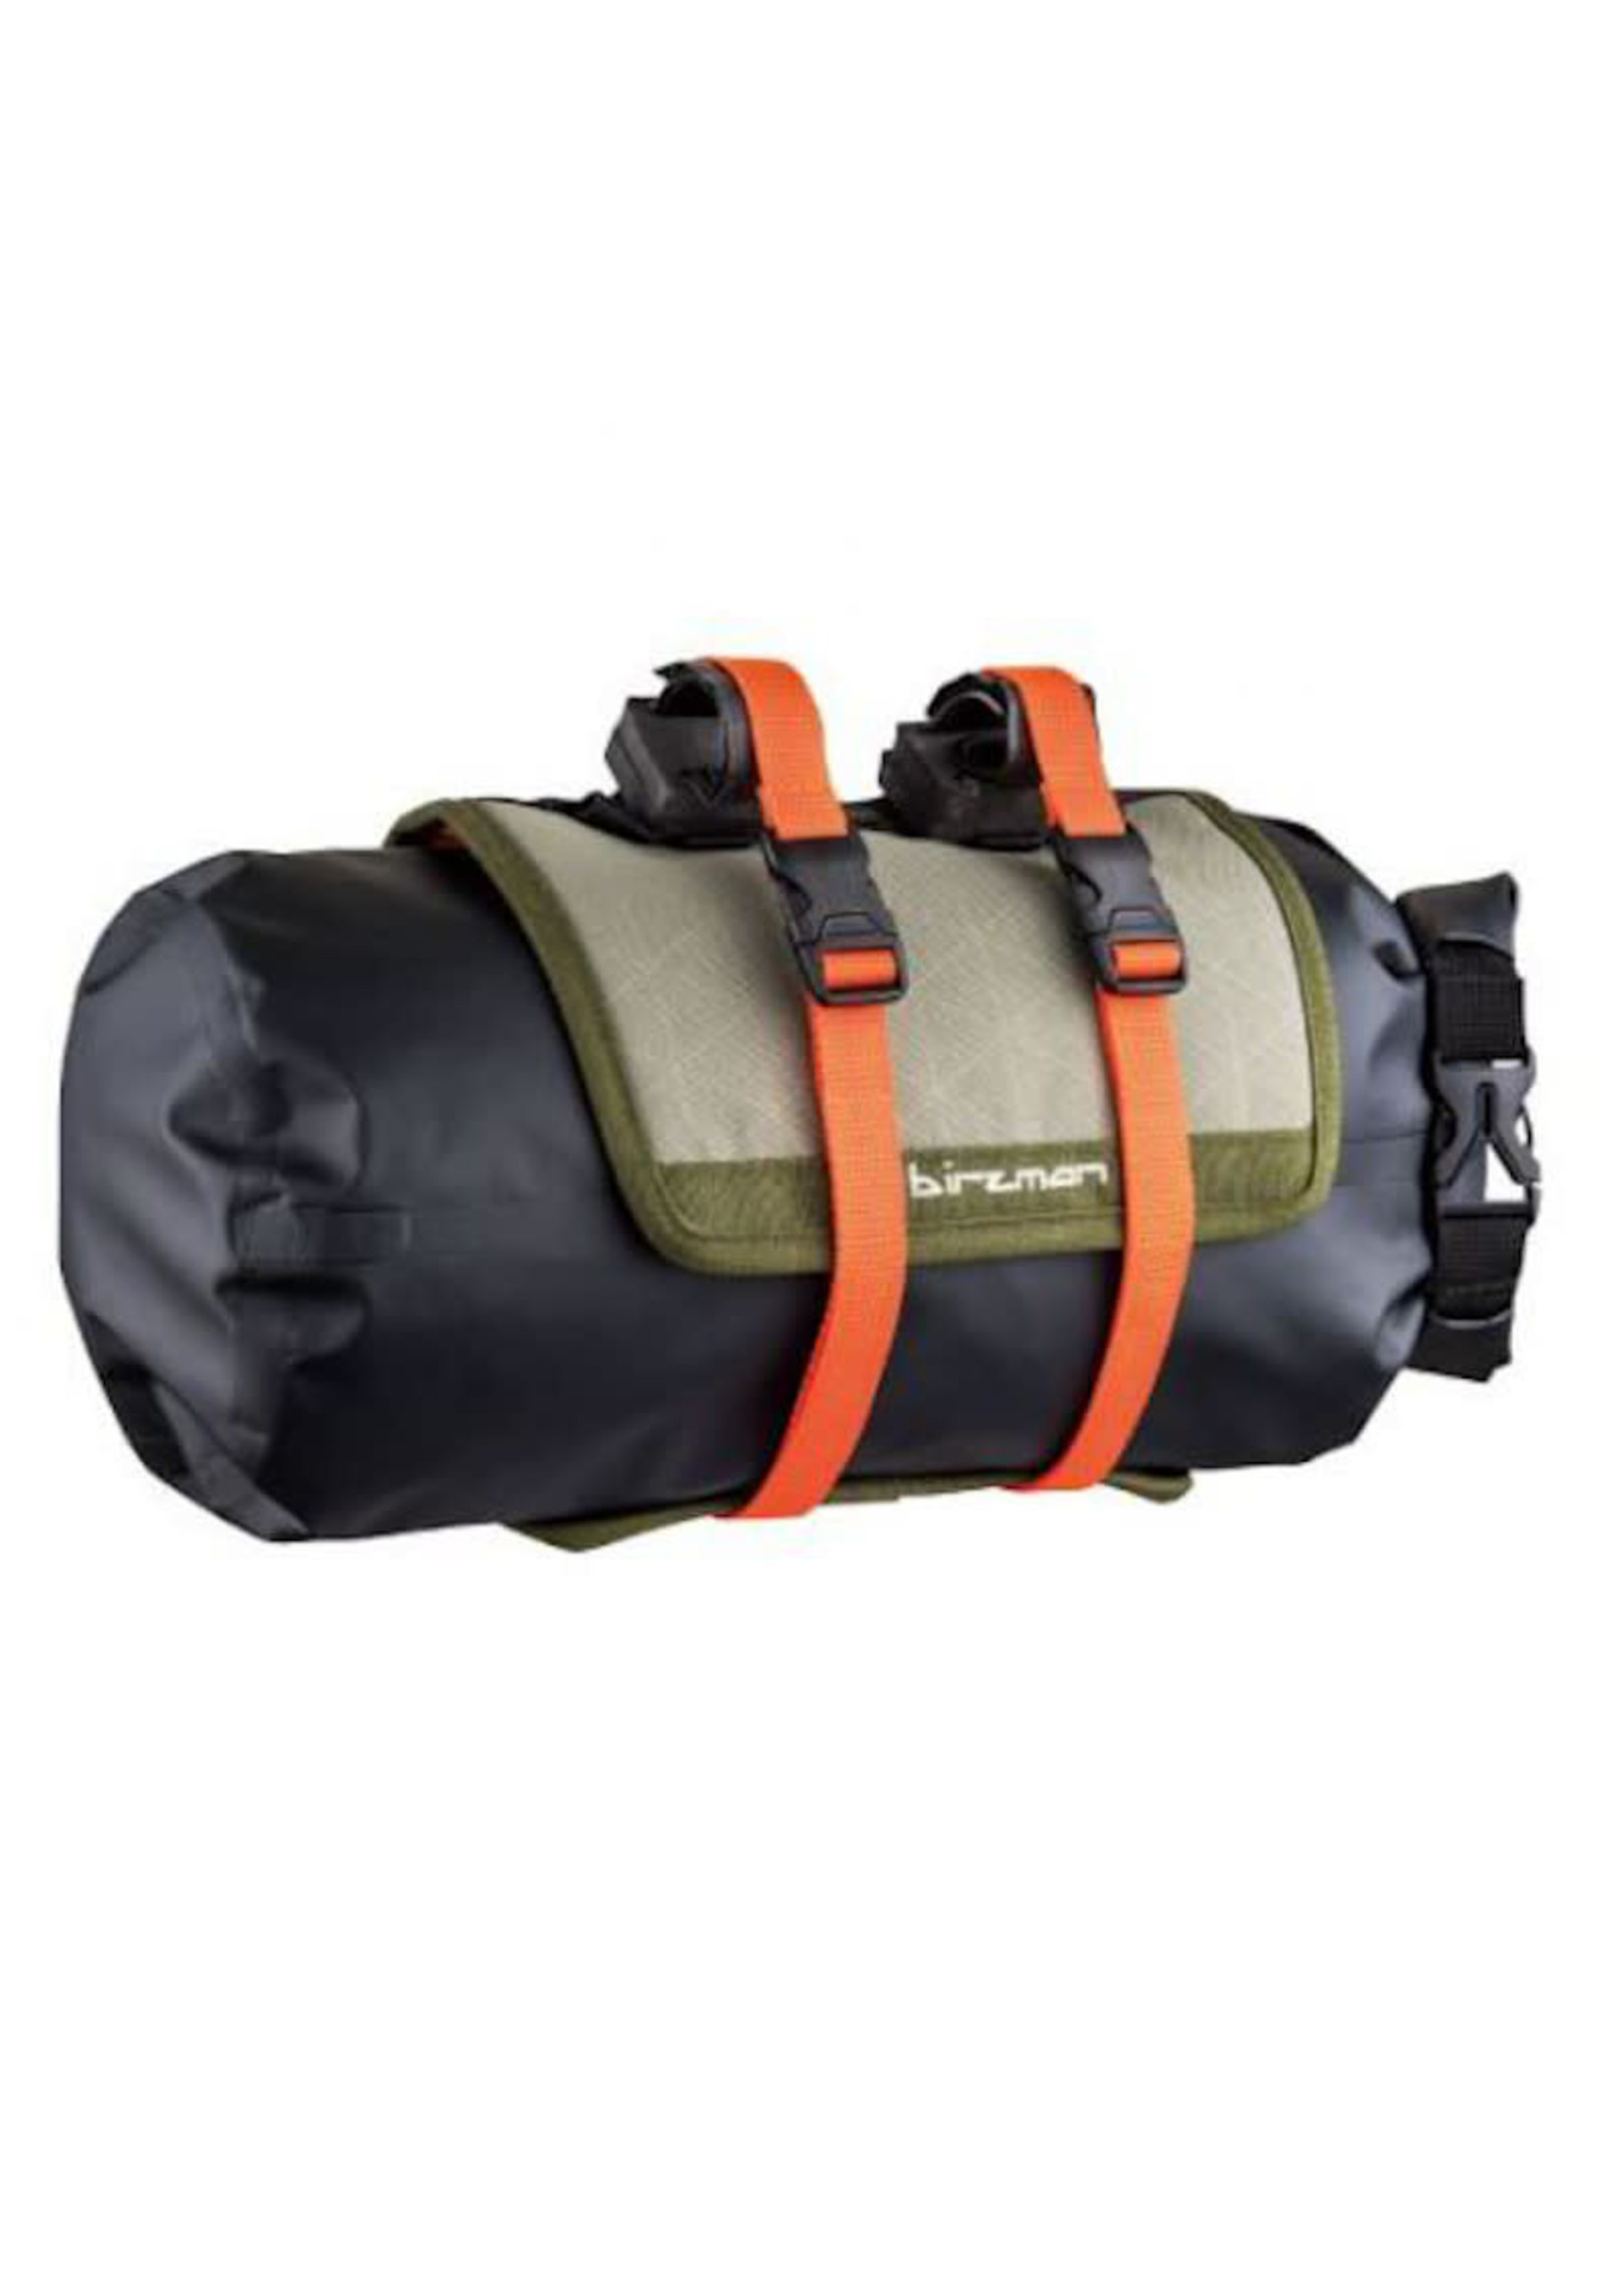 Birzman - Packman Travel, Handlebar Pack, Waterproof High density fabric, 9.5L